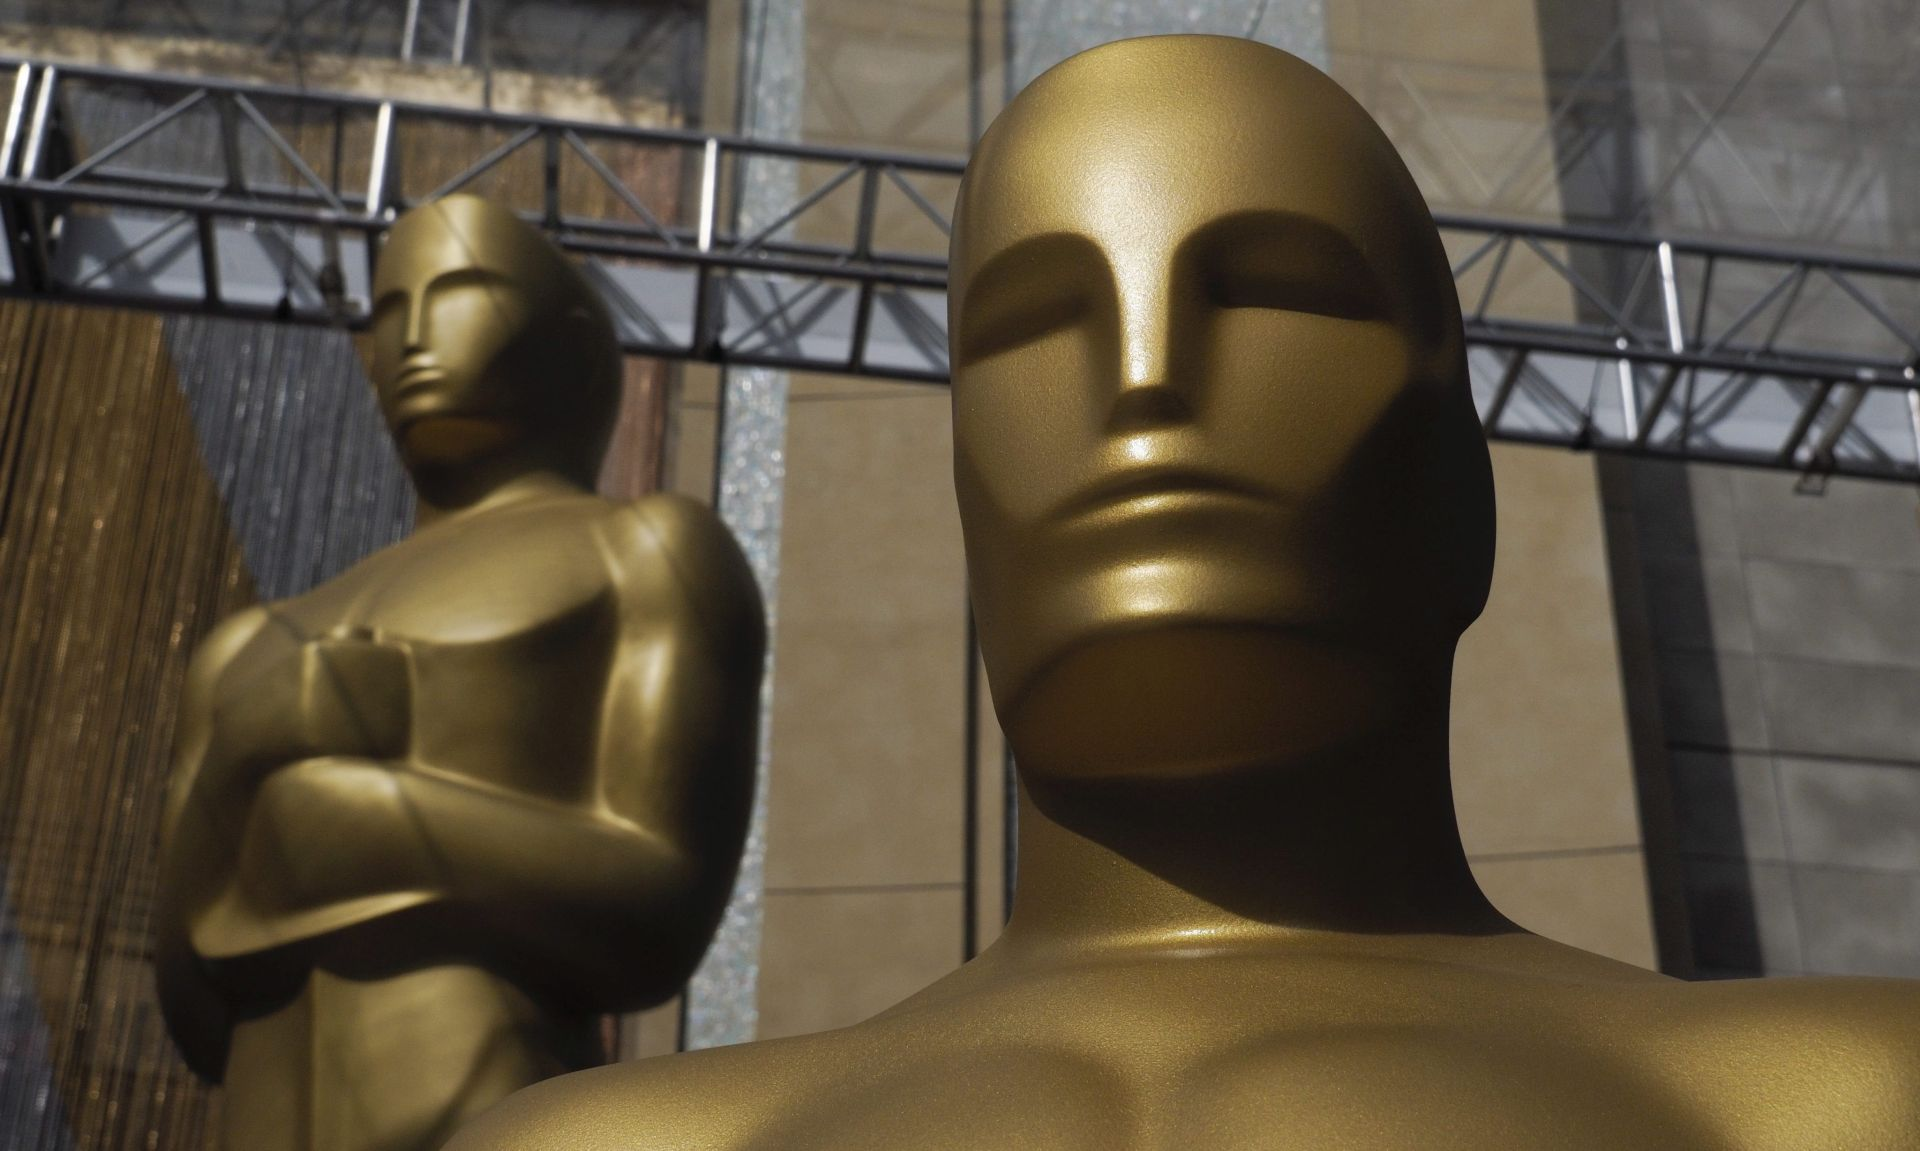 NOĆAS DODJELA OSCARA Leonardo di Caprio i 'Povratnik' veliki favoriti